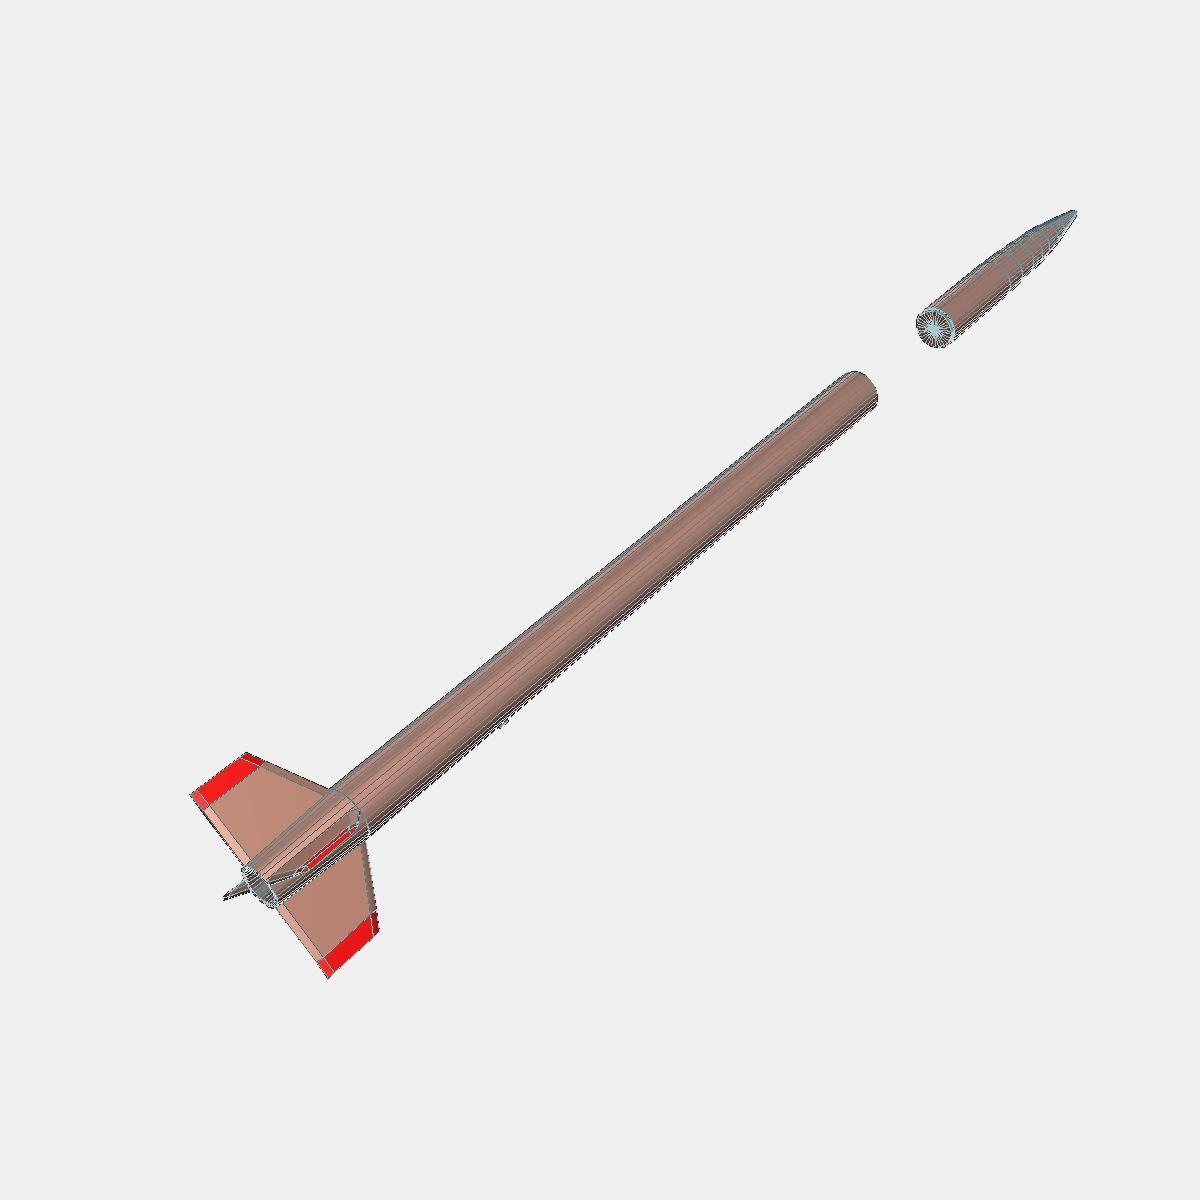 Japanese MT-135 Rocket 3d model 3ds dxf fbx blend cob dae X  obj 158759